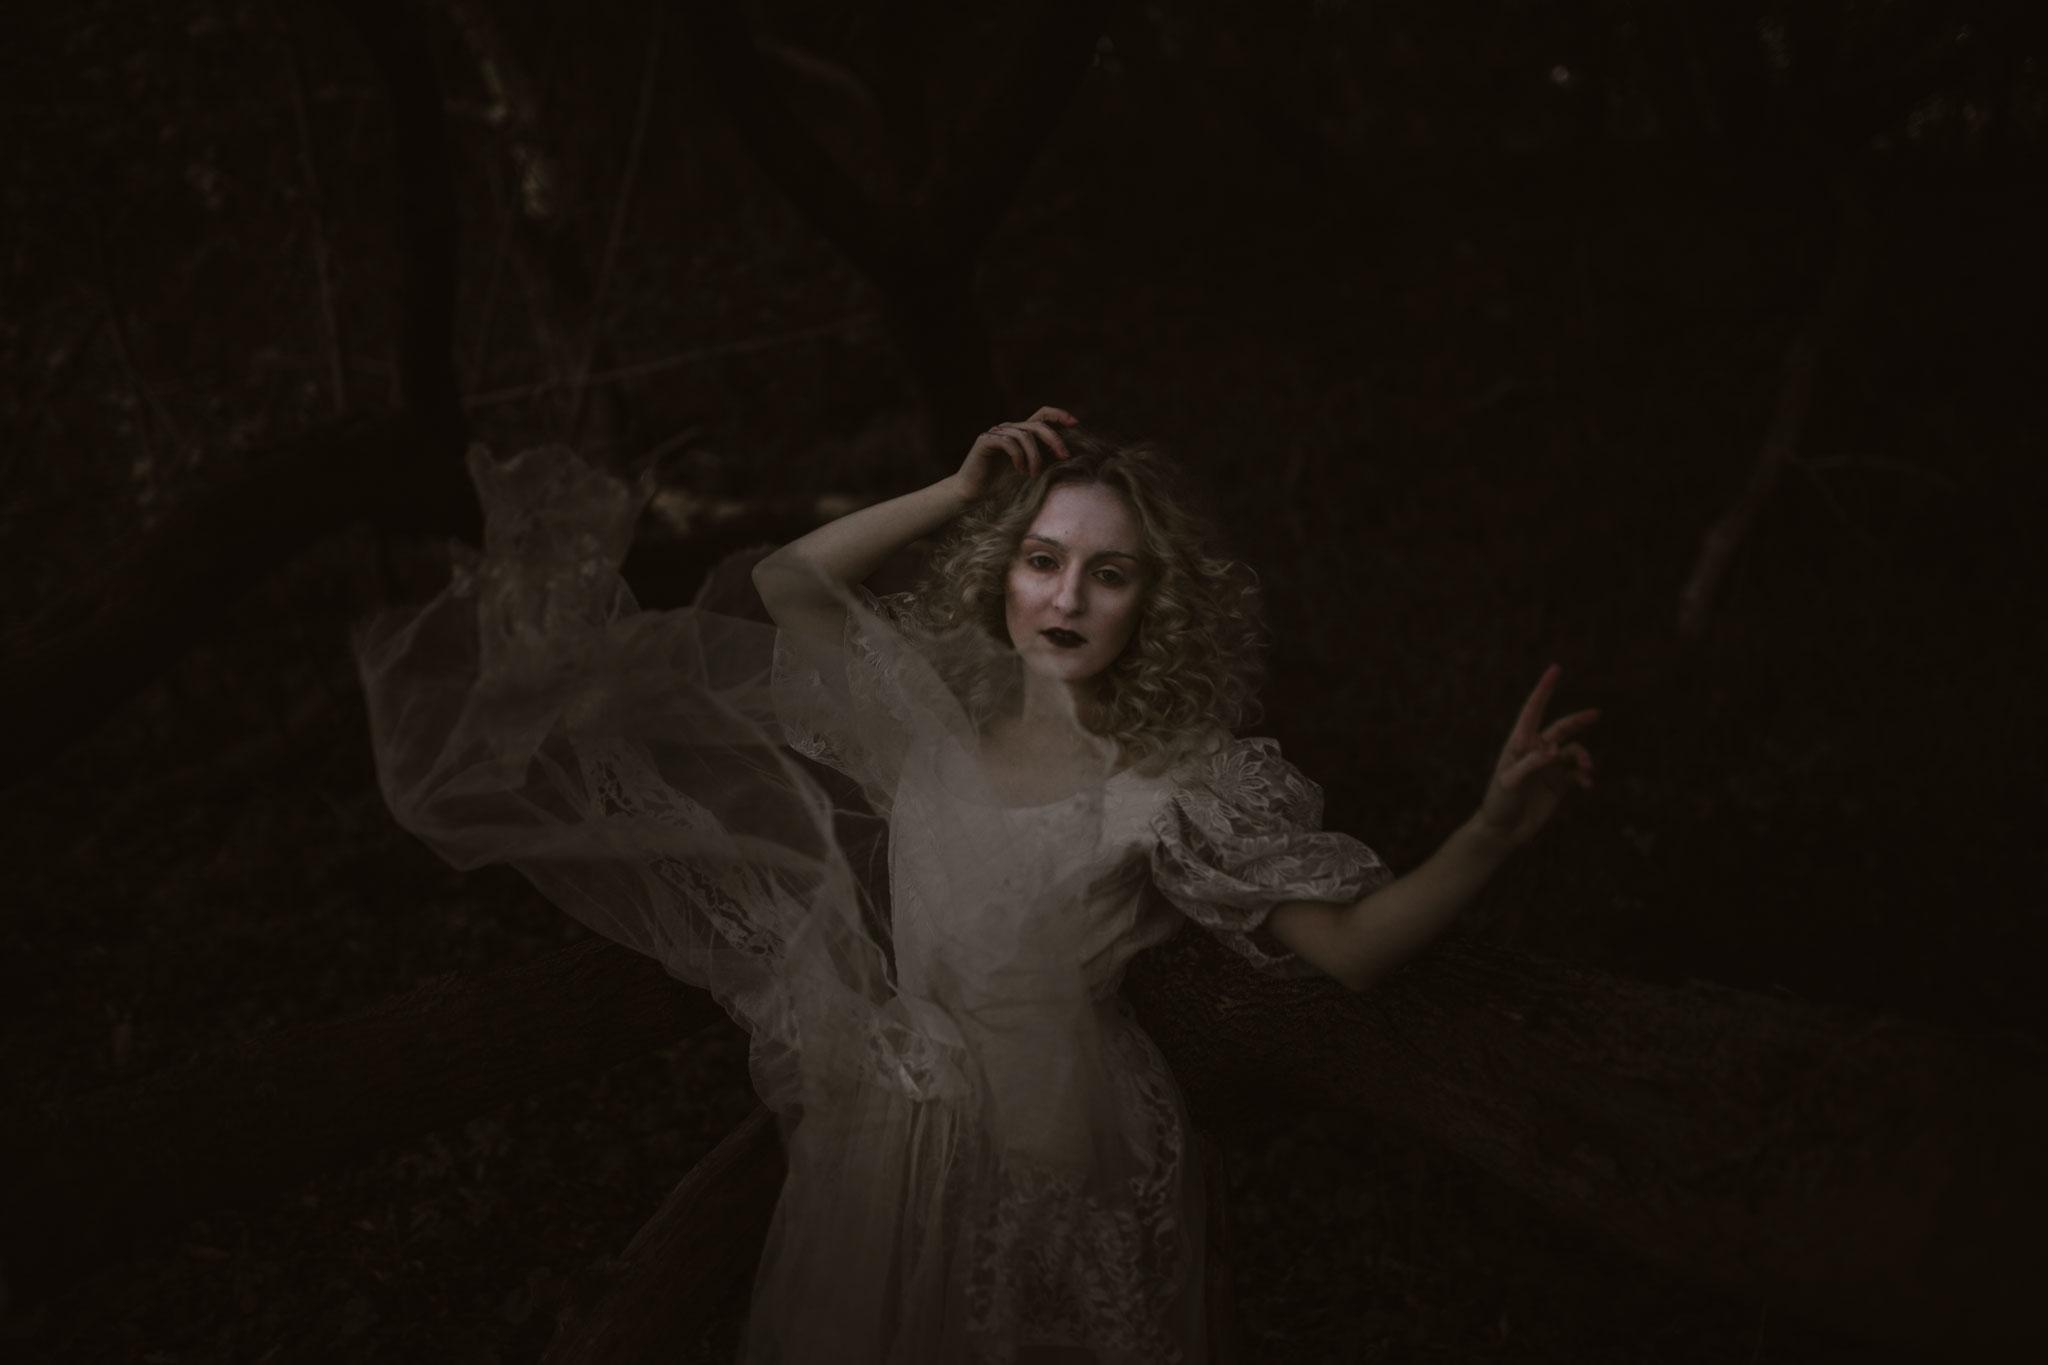 pale-witch-128fb.jpg